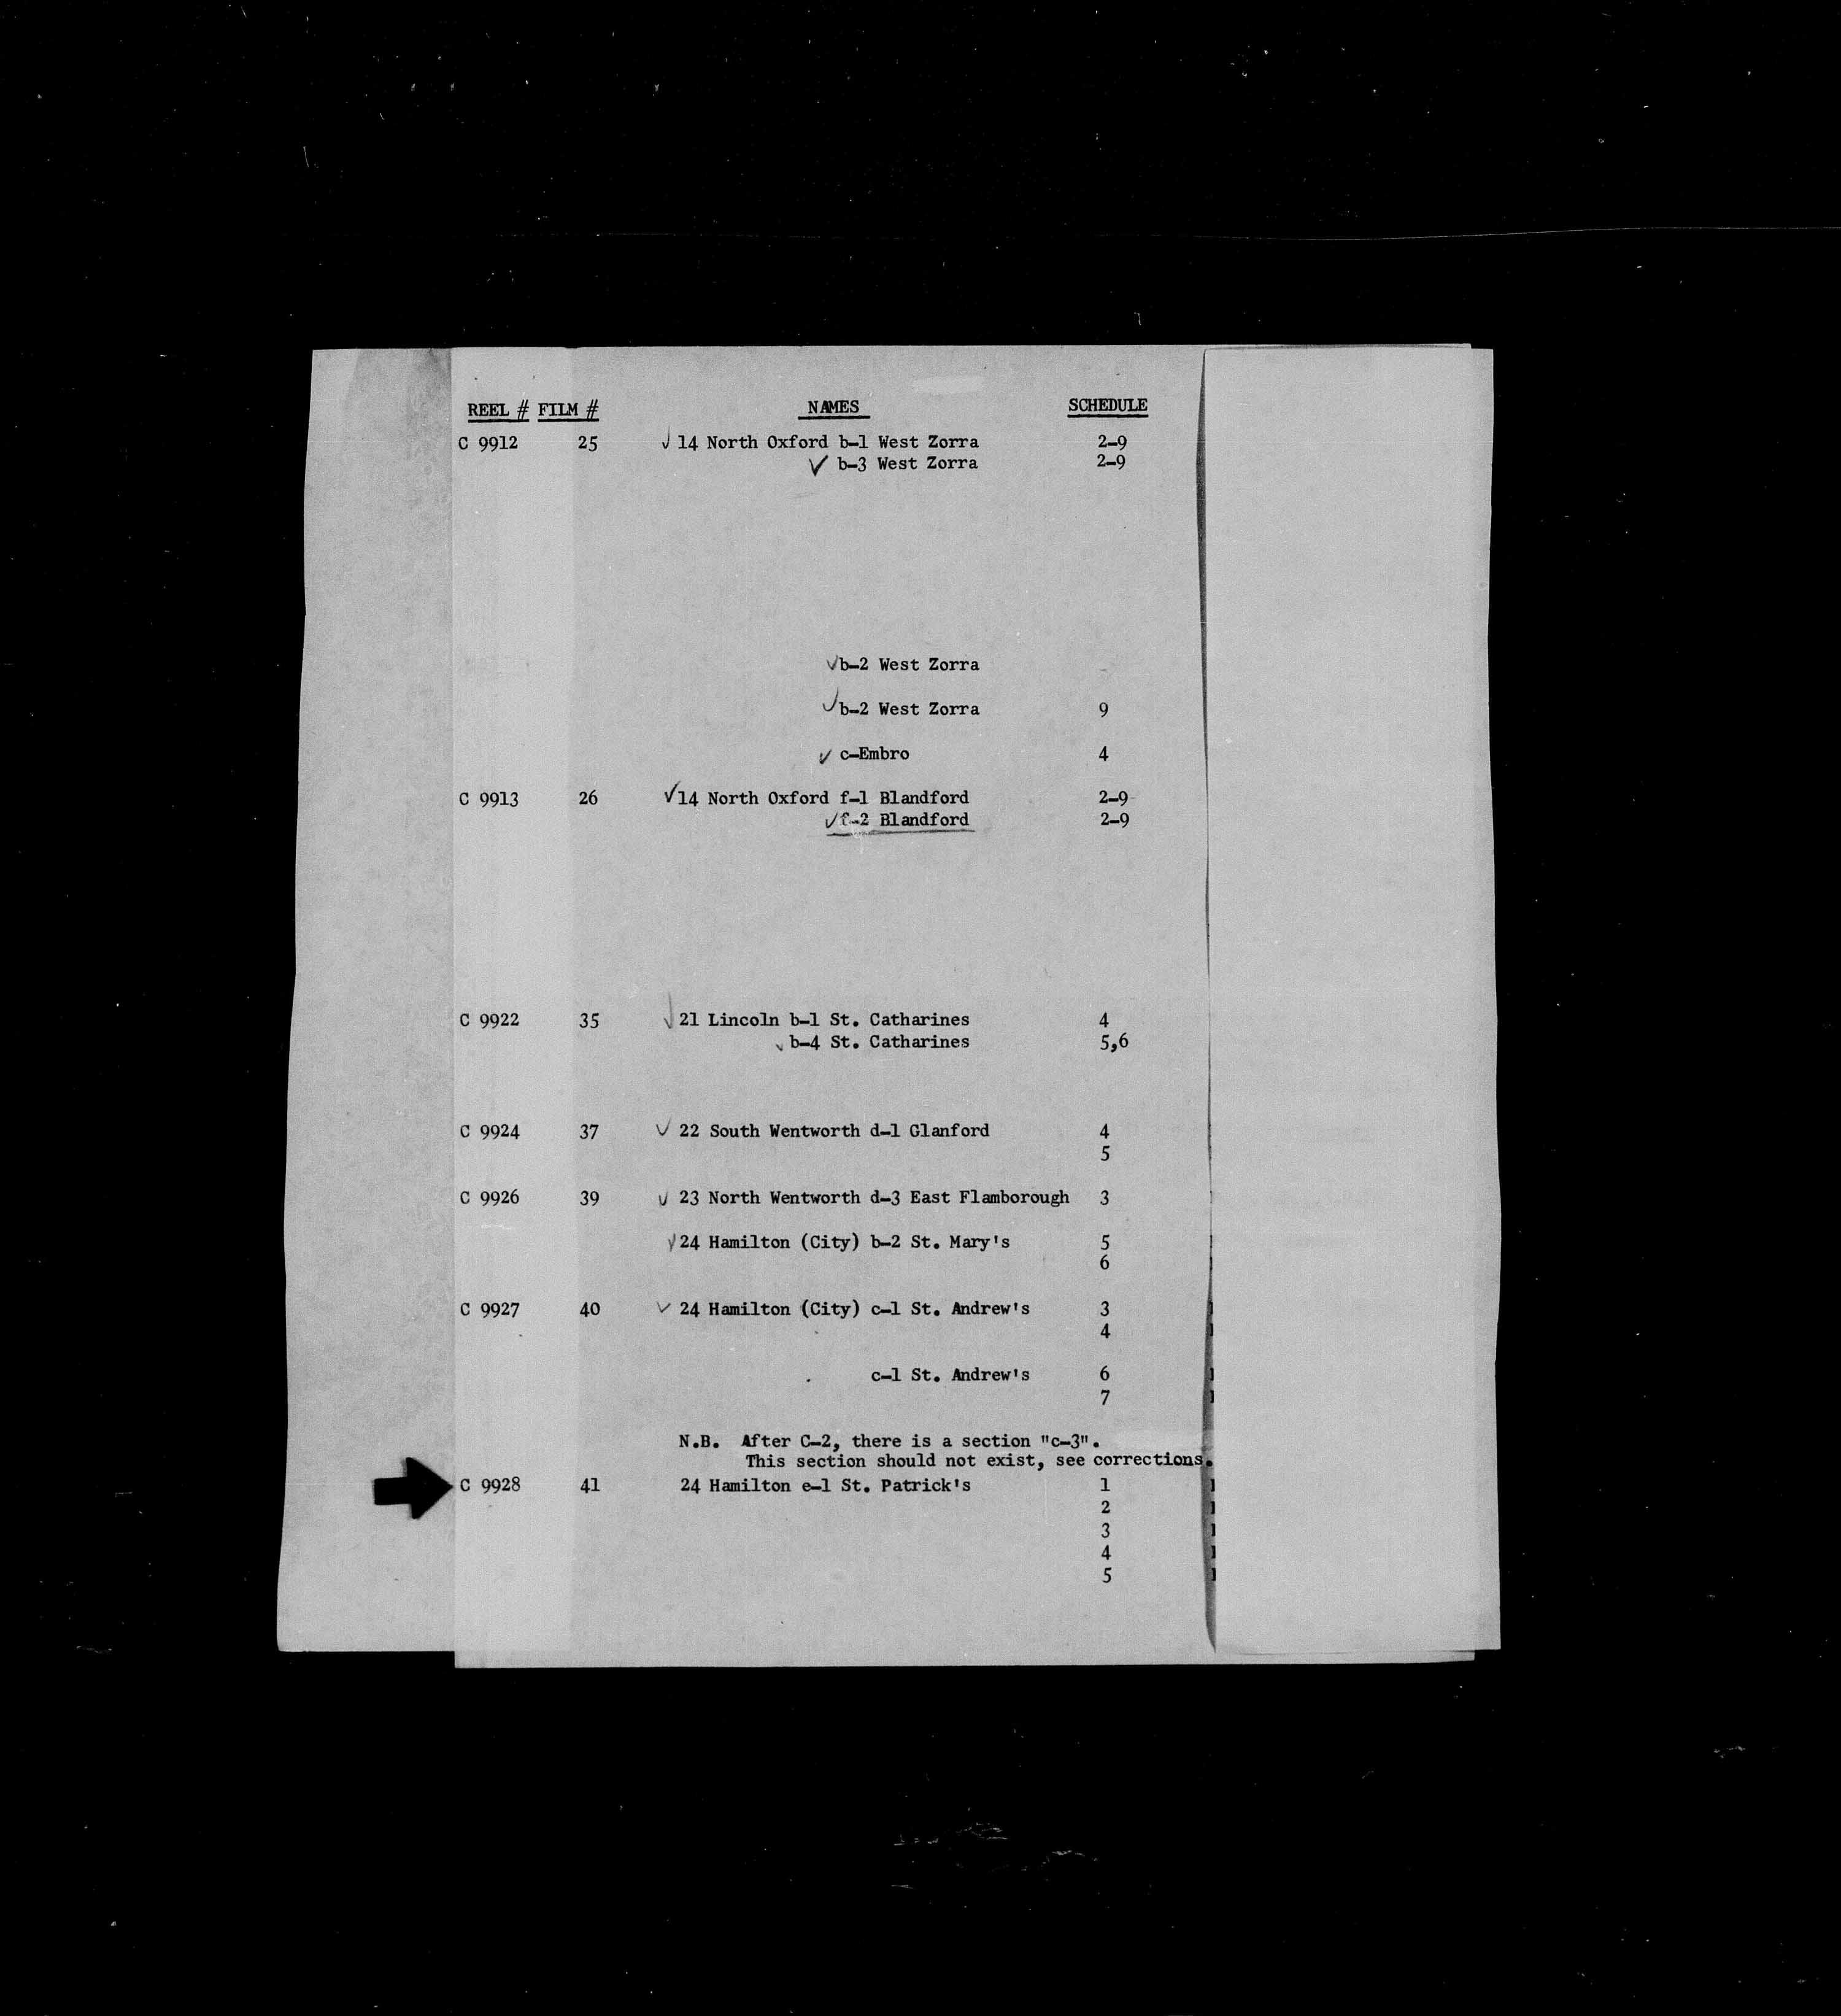 Titre: Recensement du Canada (1871) - N° d'enregistrement Mikan: 194056 - Microforme: c-9928